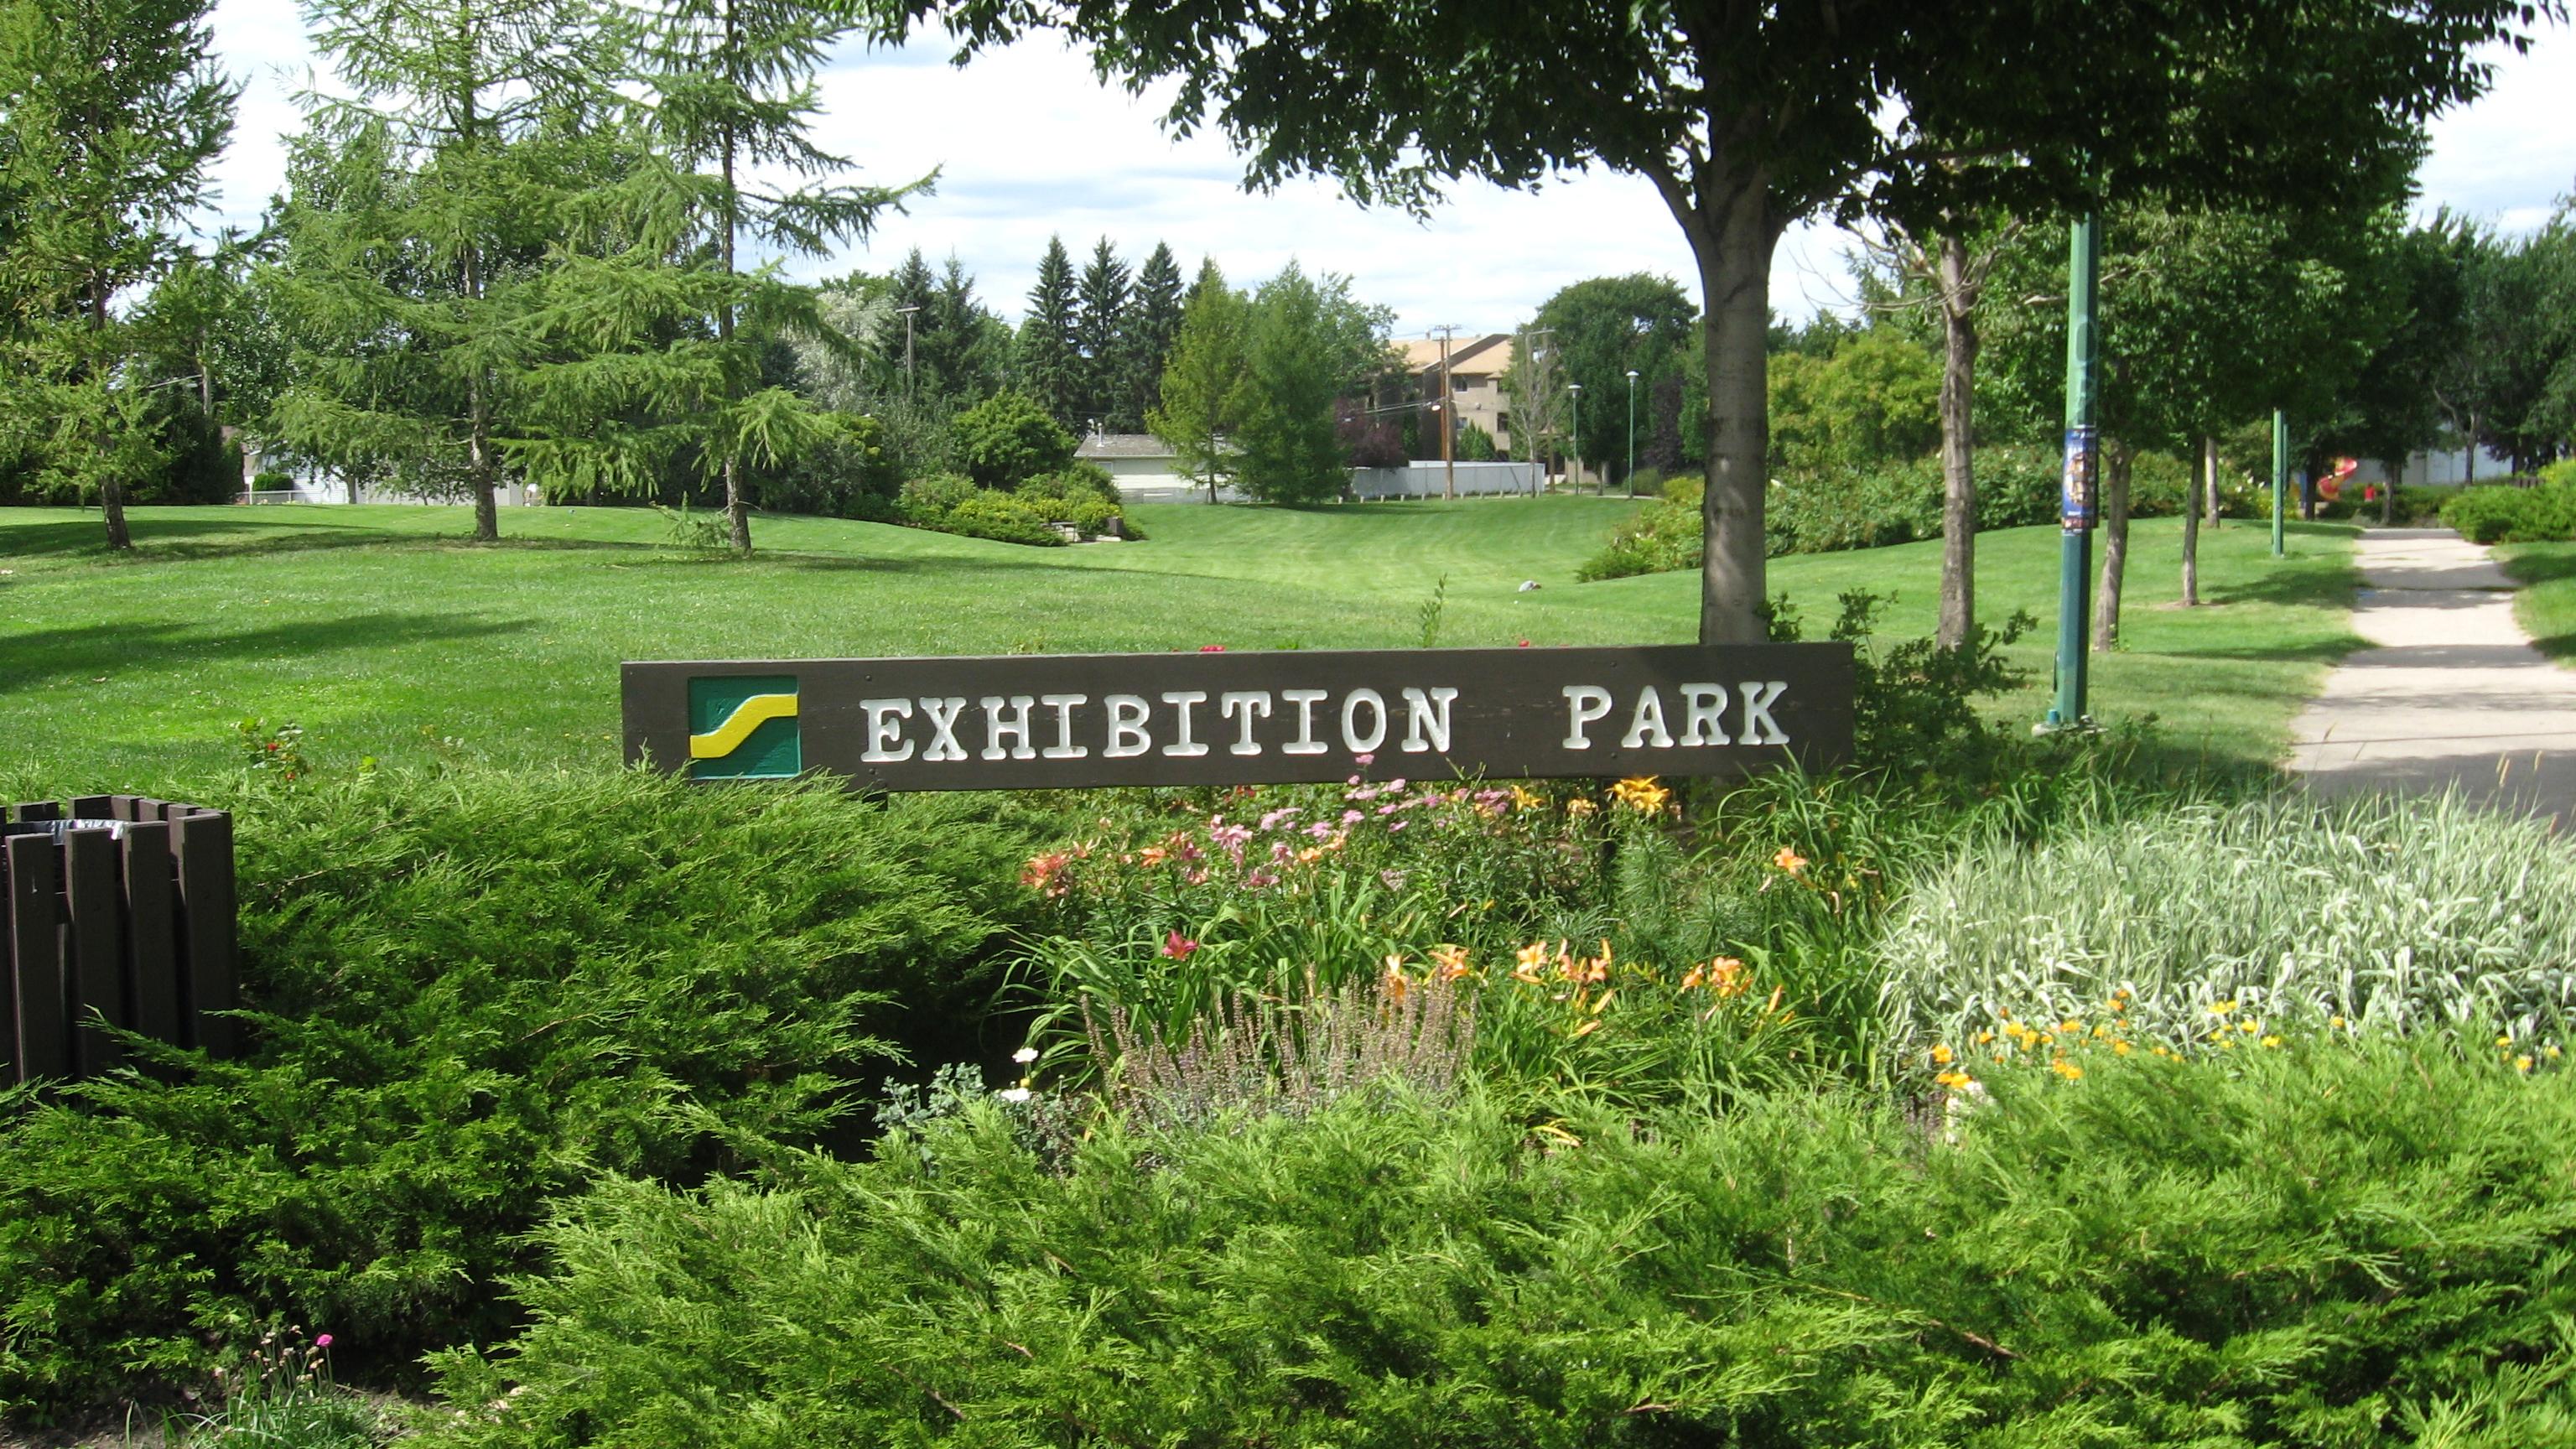 Newcastle Island Park Nanaimo Bc Canada